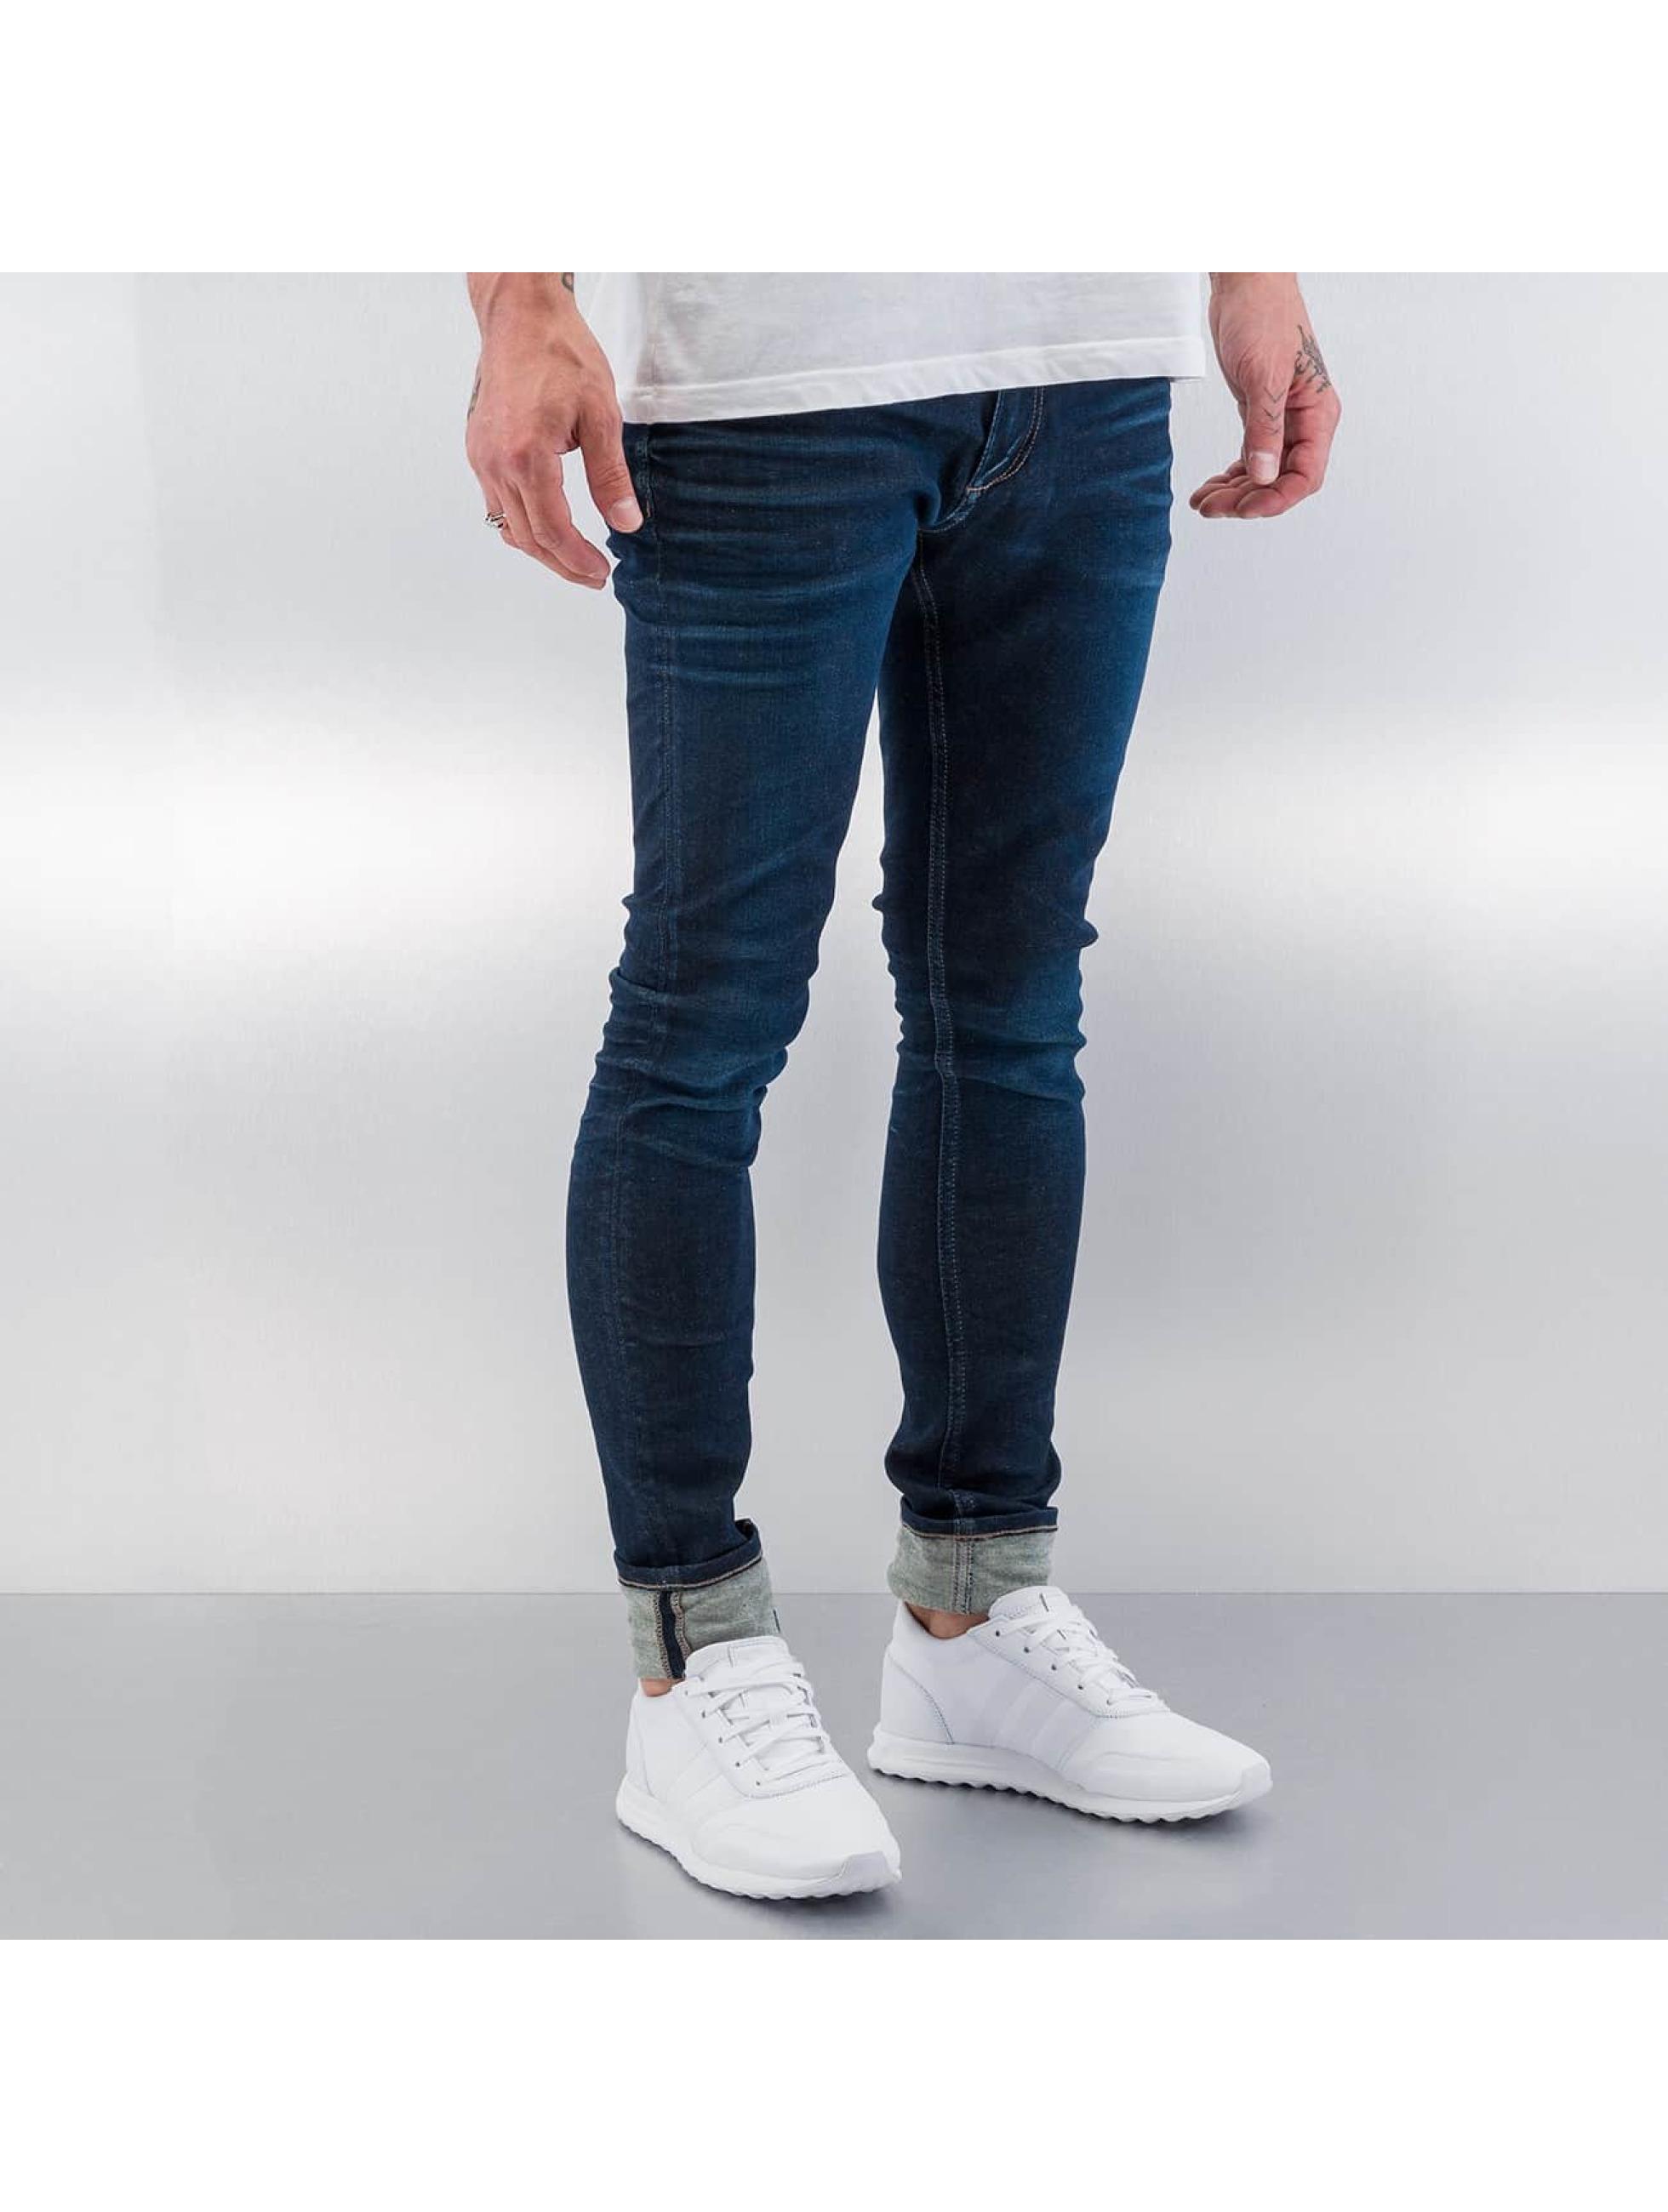 Jack & Jones Skinny Jeans jjiLiam jjOriginal blue